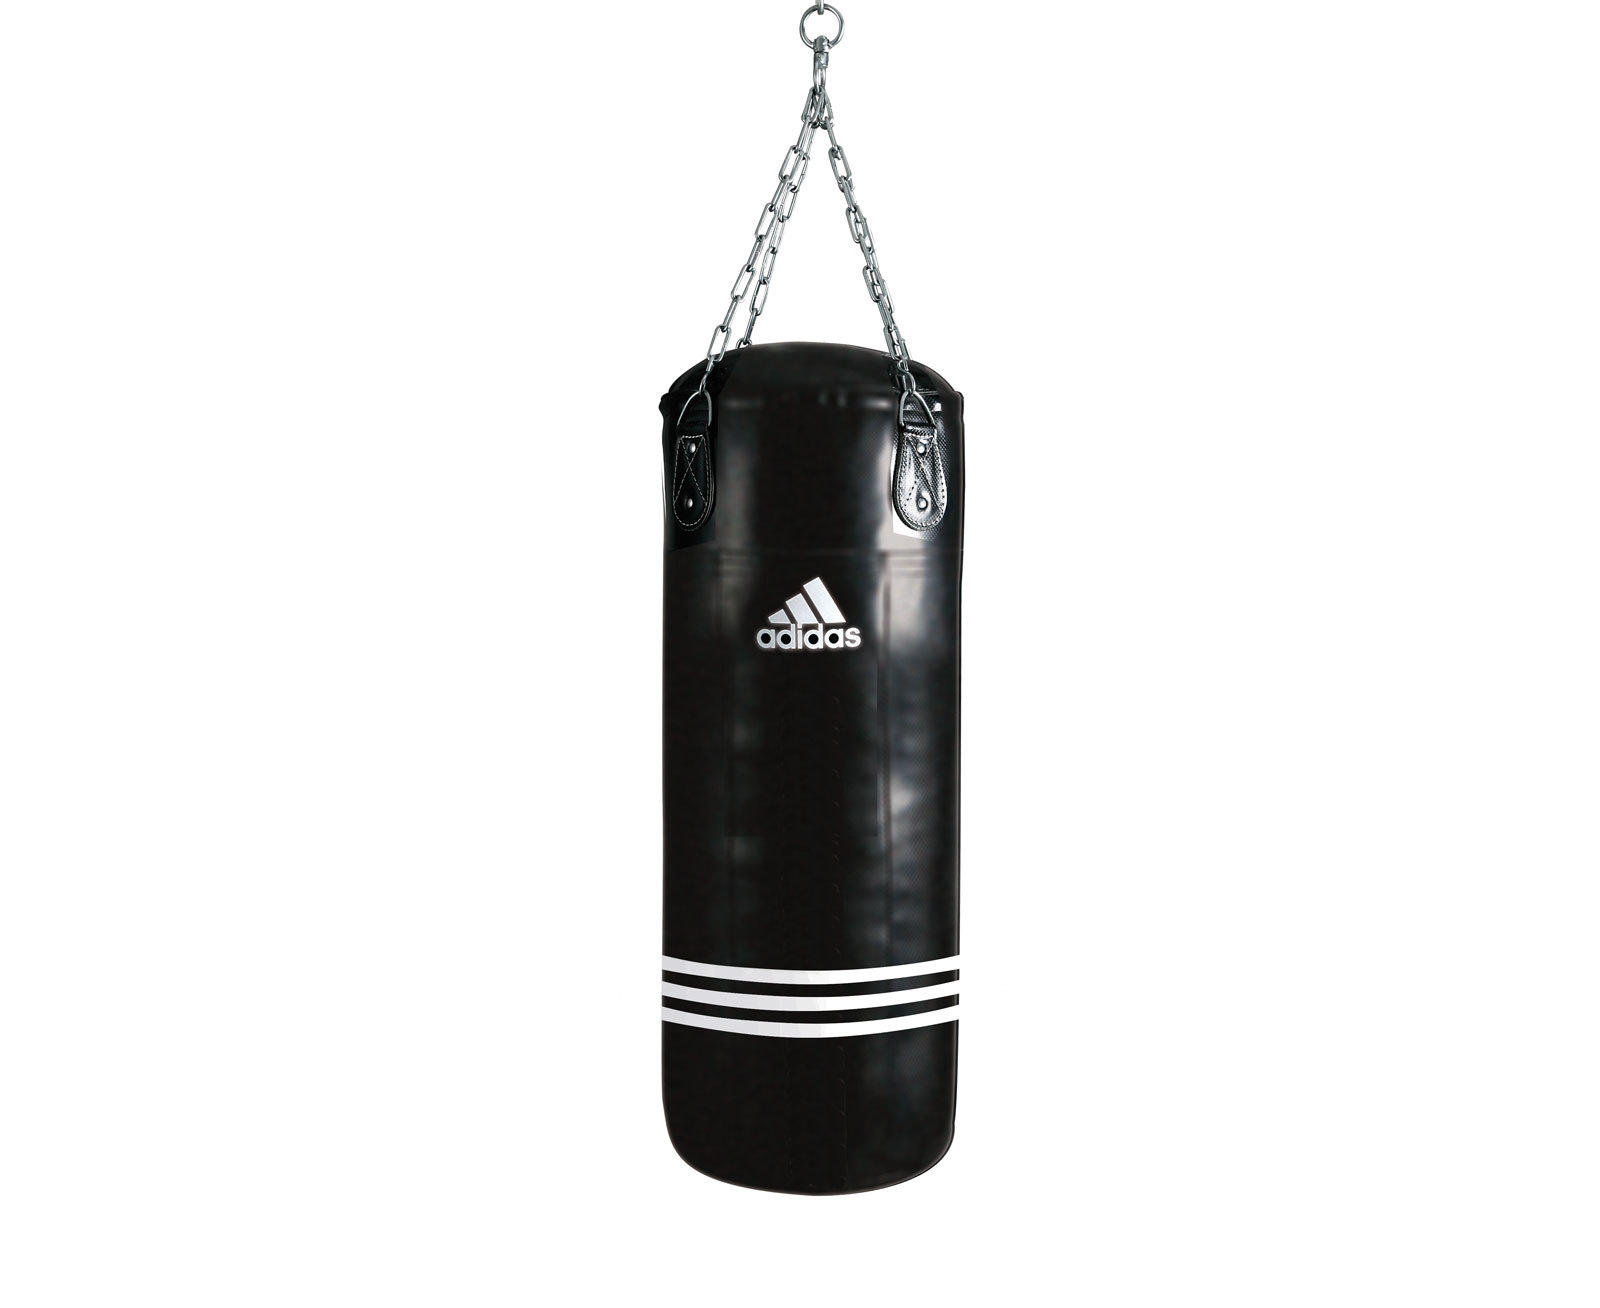 Боксерские мешки/груши МЕШОК БОКСЕРСКИЙ BIGGER FATTER BAG ADIDAS meshok_bokserskiy_bigger_fatter_bag_chernyy.jpg